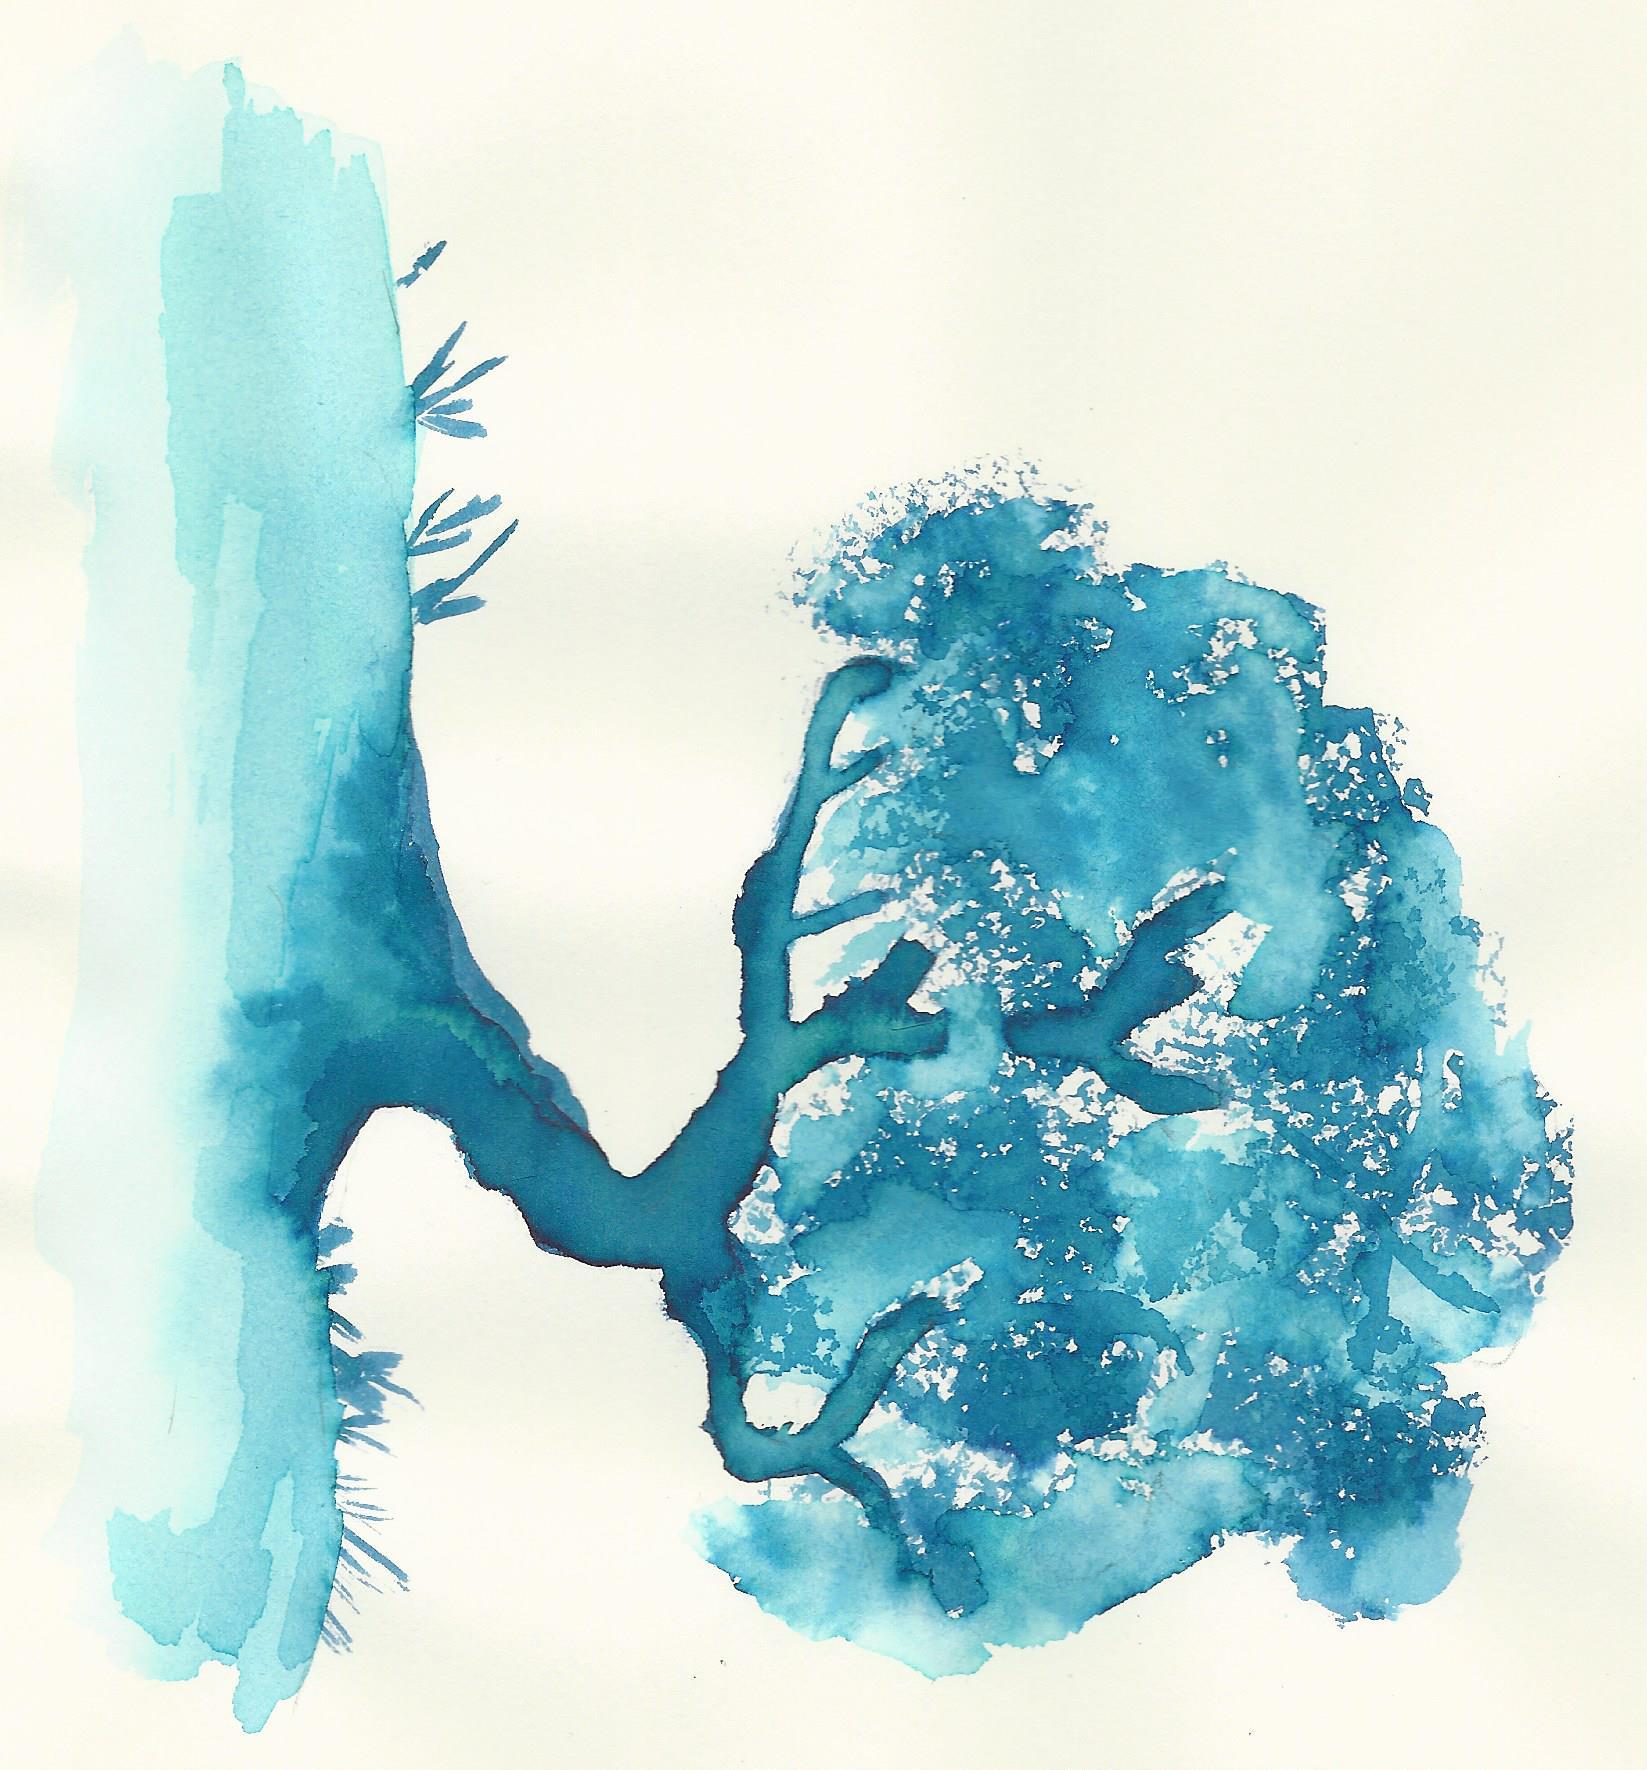 fpn_1600104042__waterman_-_blue_black_-_